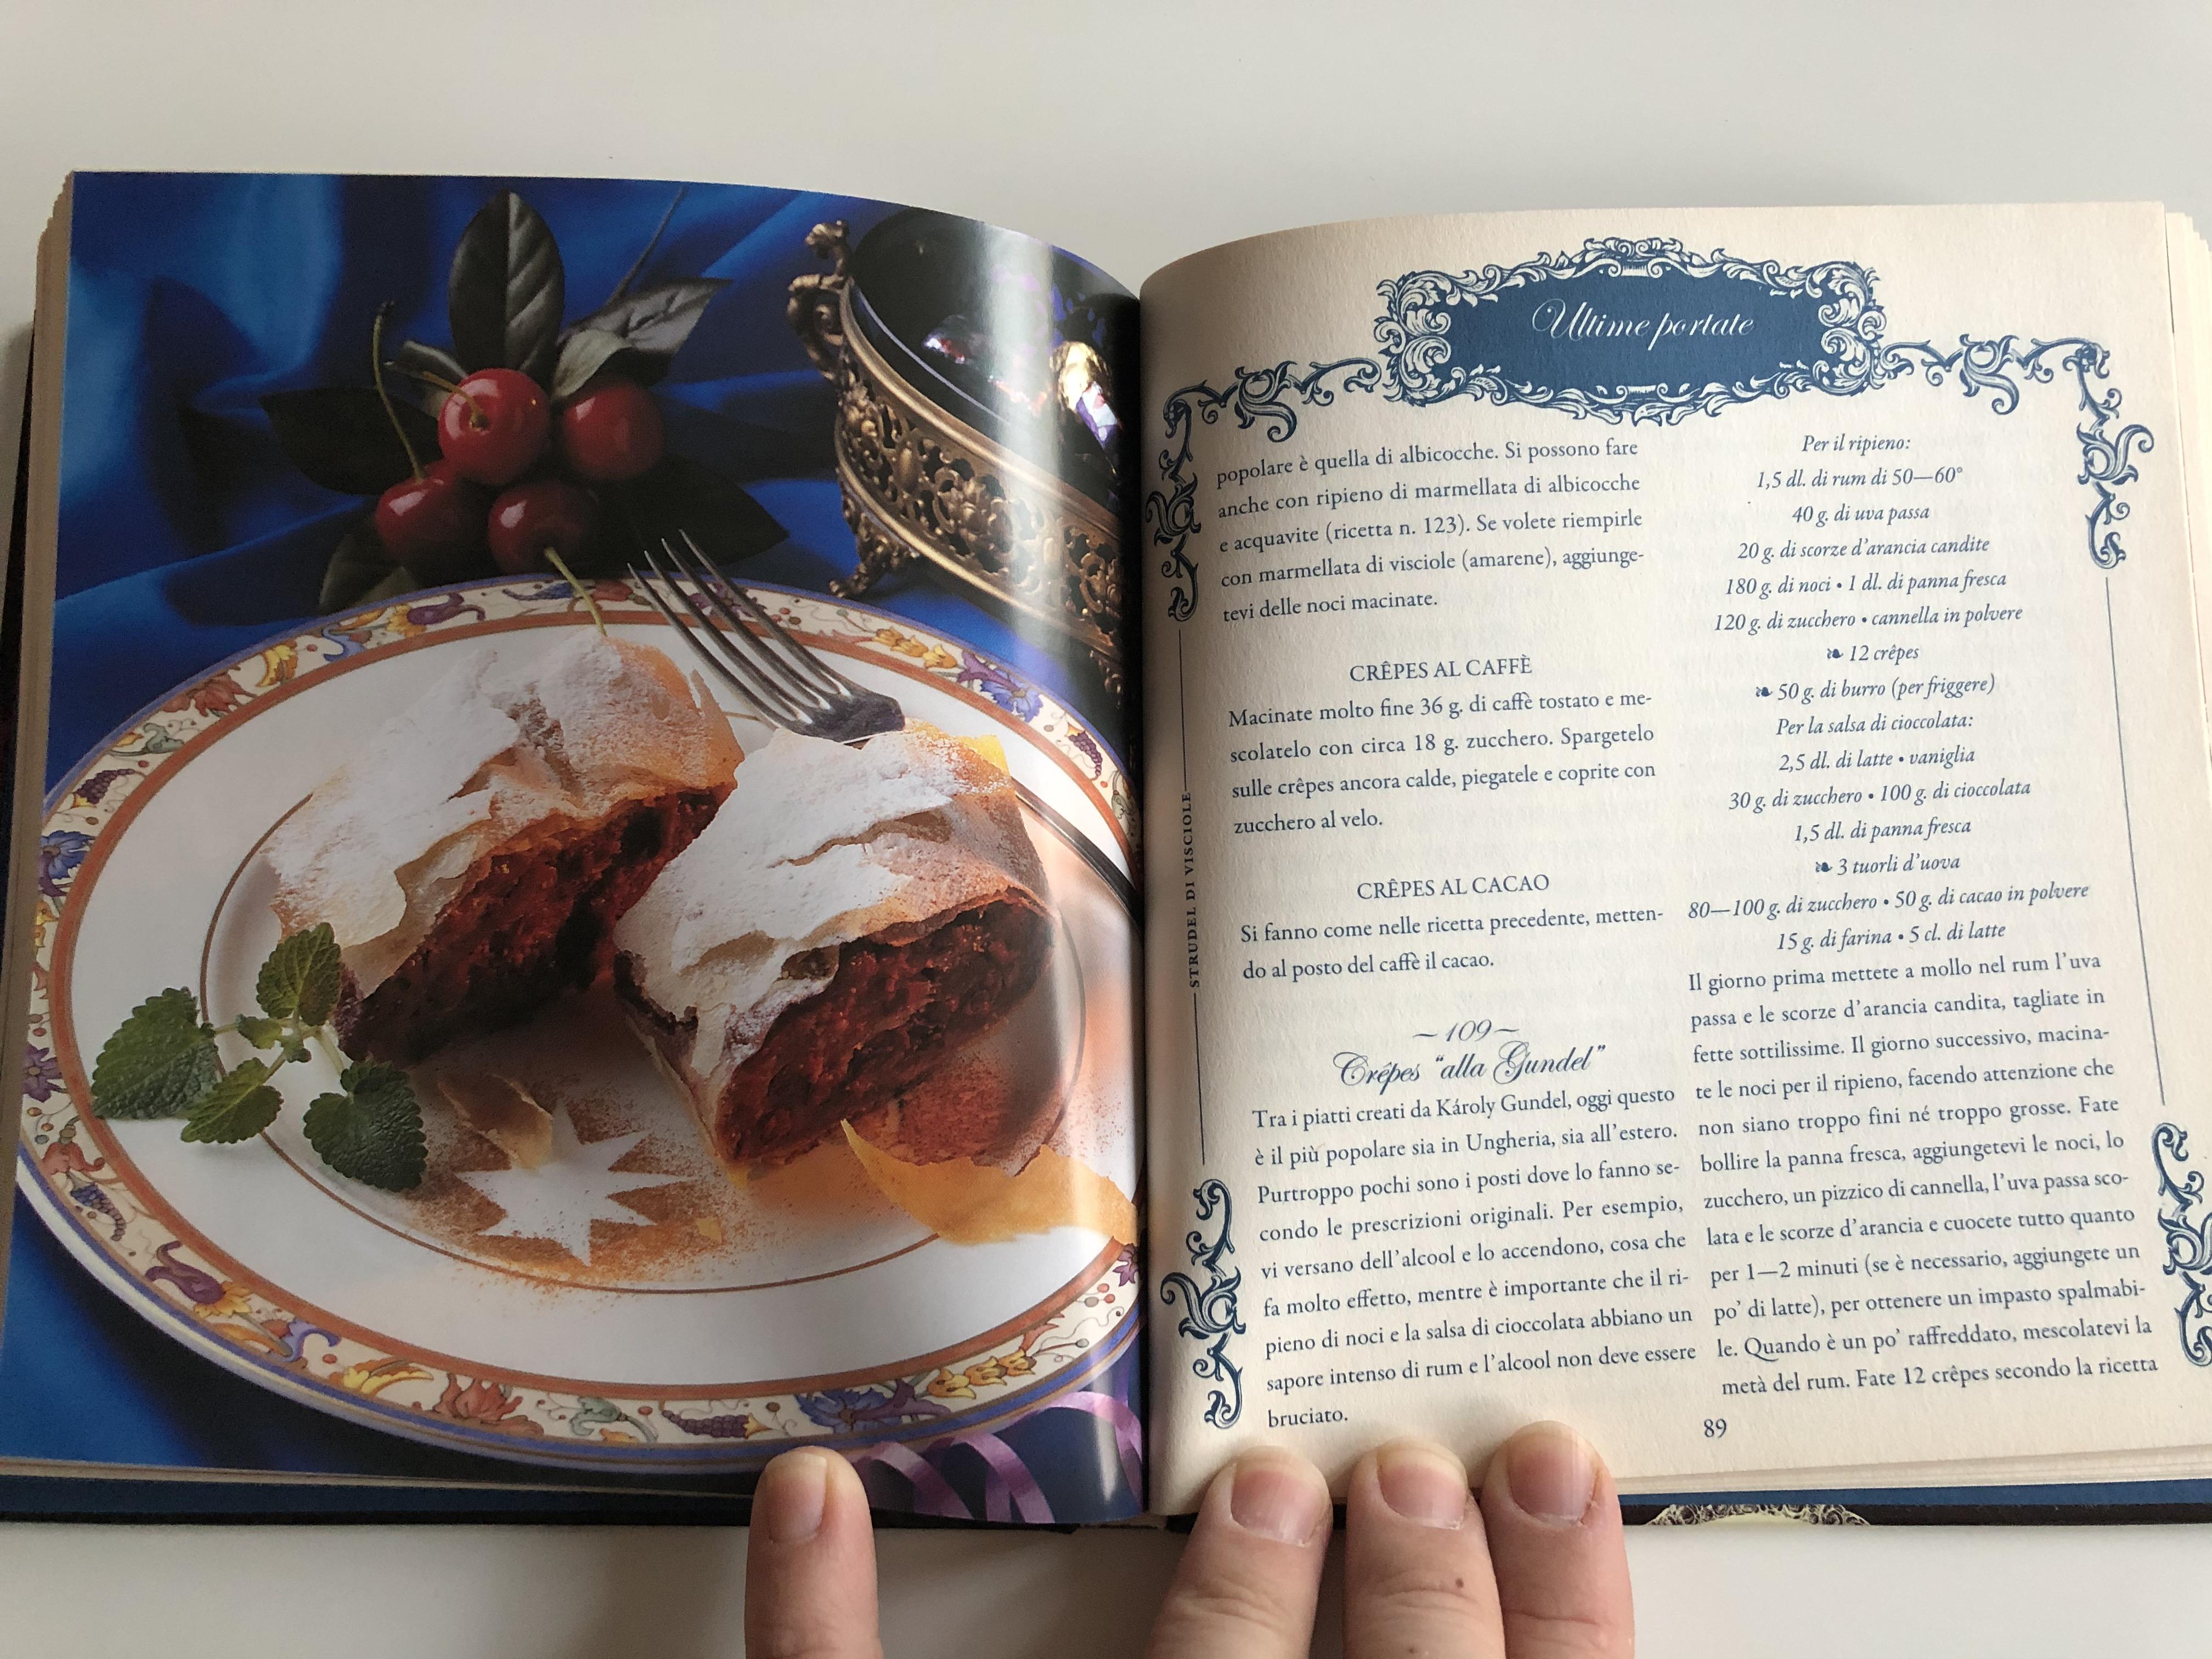 la-cucina-ungherese-by-k-roly-gundel-rielaborat-dai-figli-ferenc-gundel-imre-gundel-corvina-12.jpg